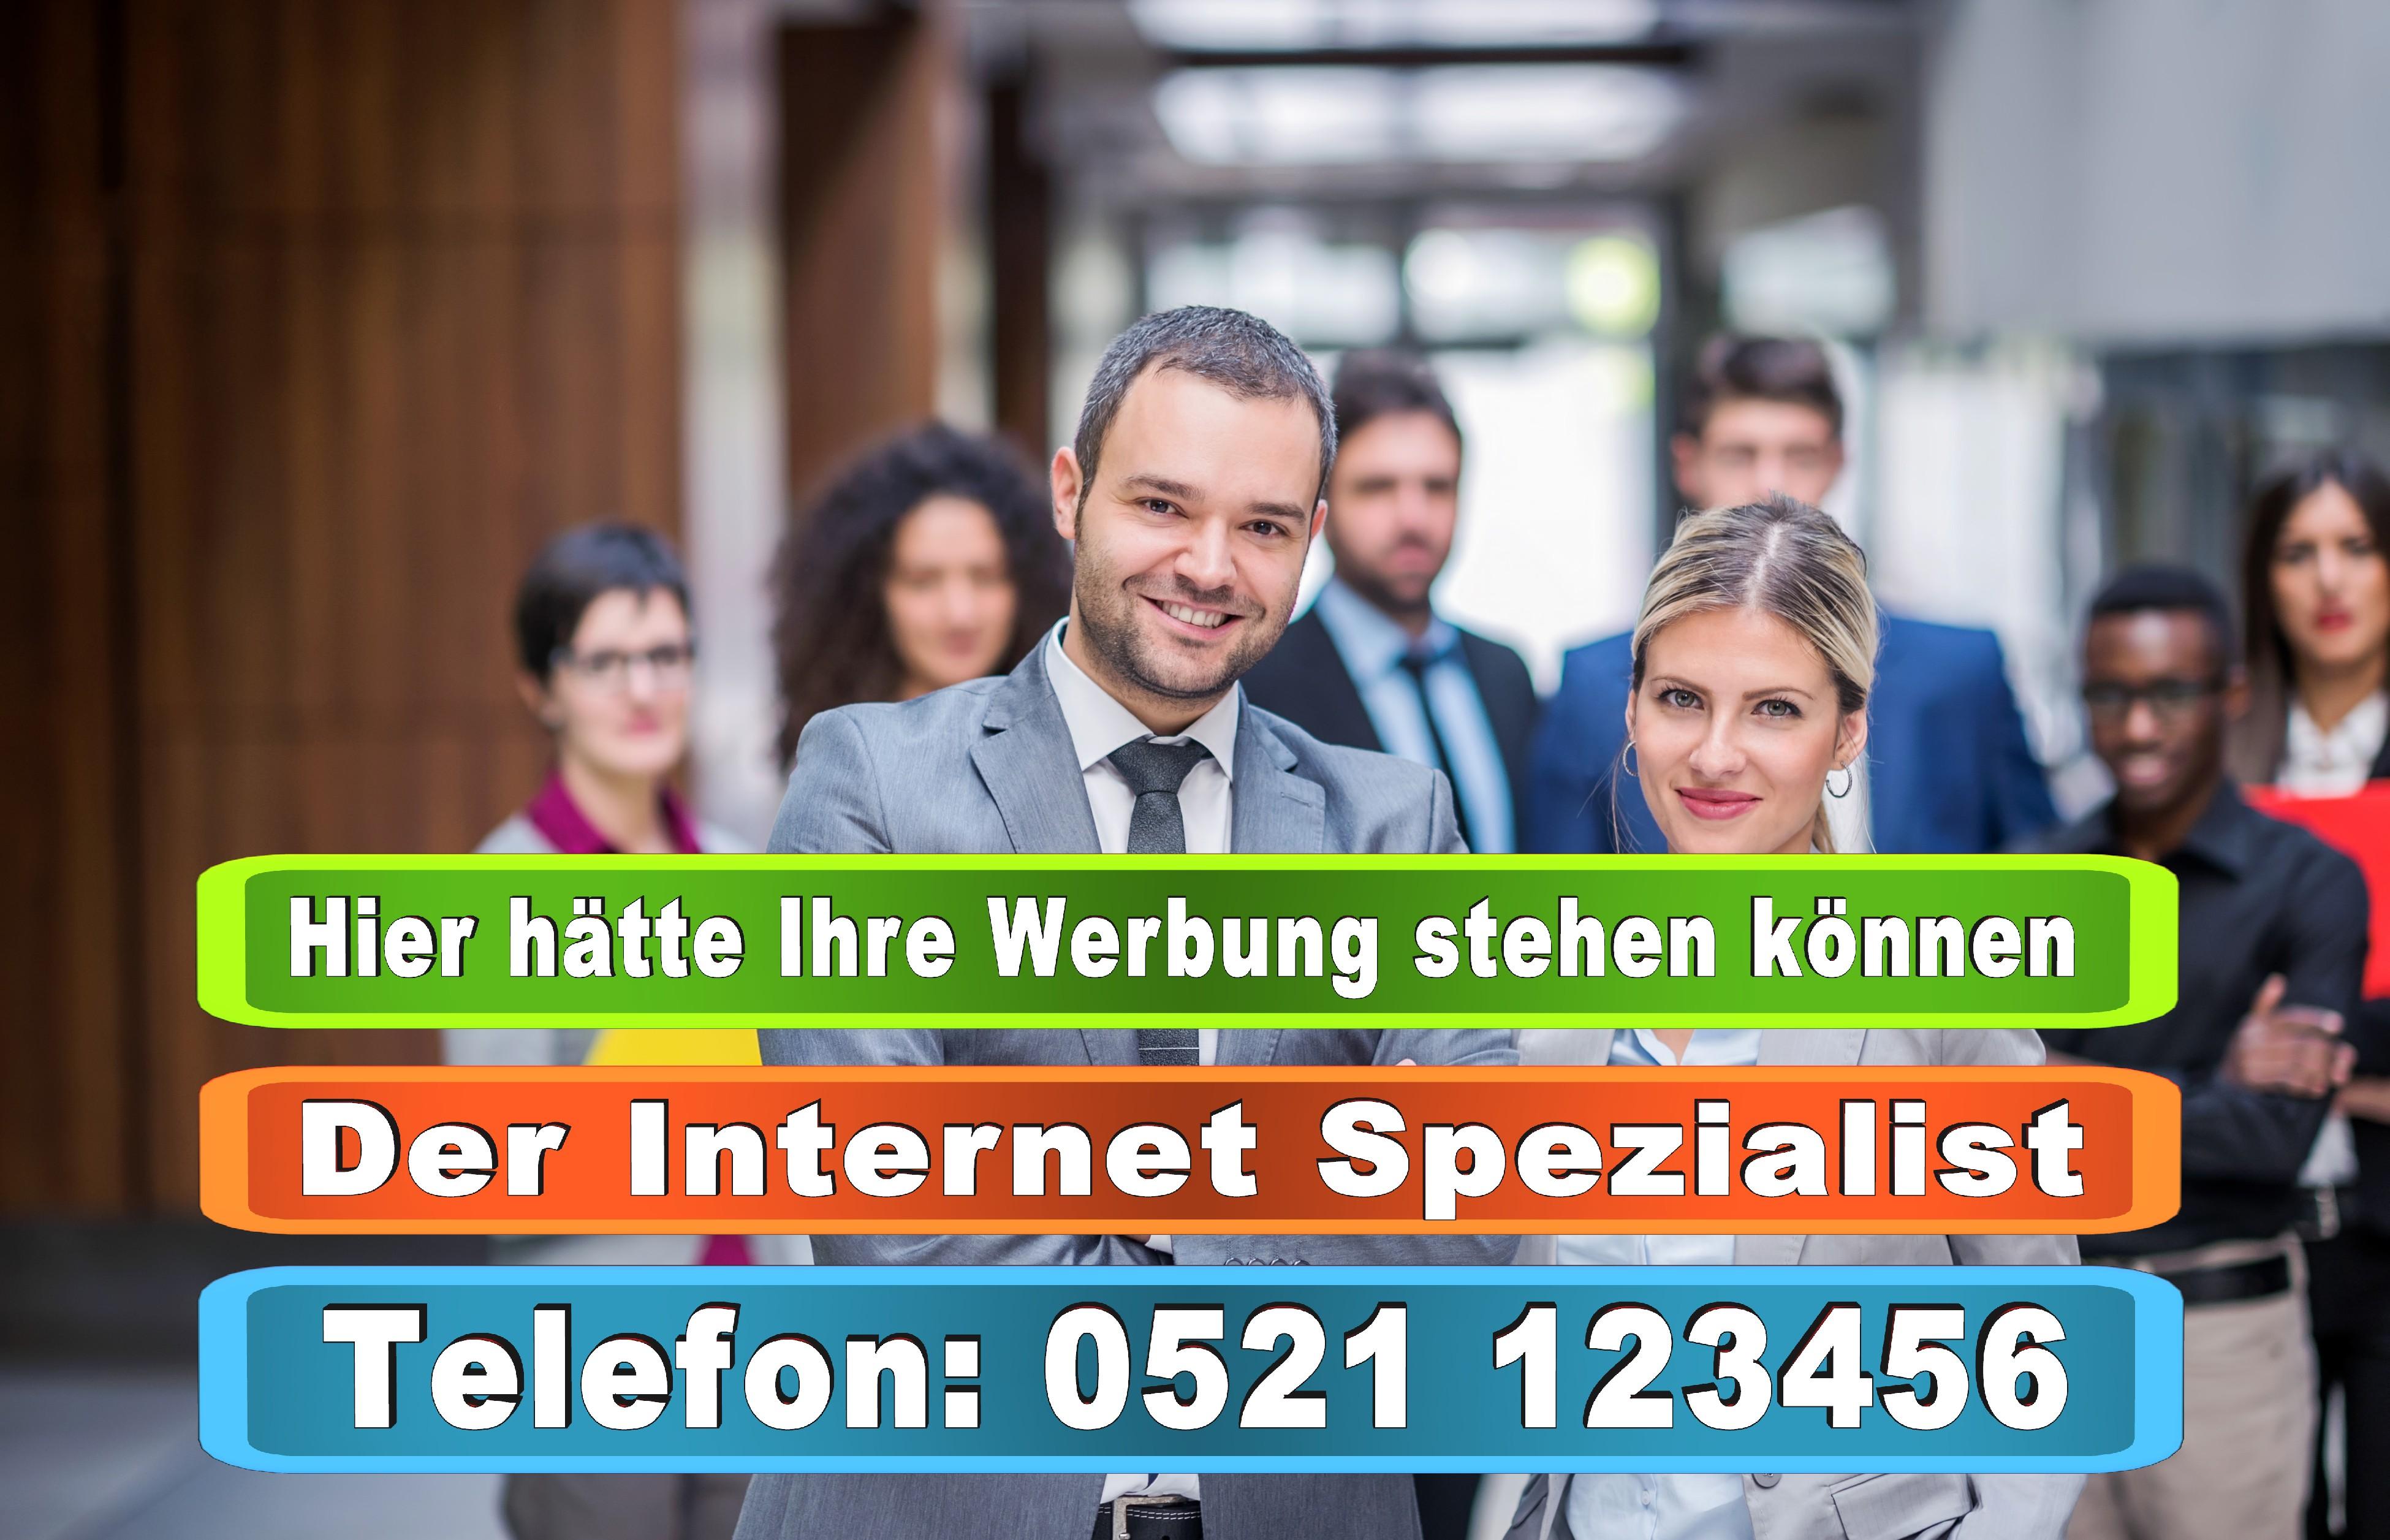 Rechtsanwaltskanzlei Bielefeld NRW OWL Rechtsanwalt Kanzlei Büro Steuerberater Bielefeld Architekt Bielefeld (28)